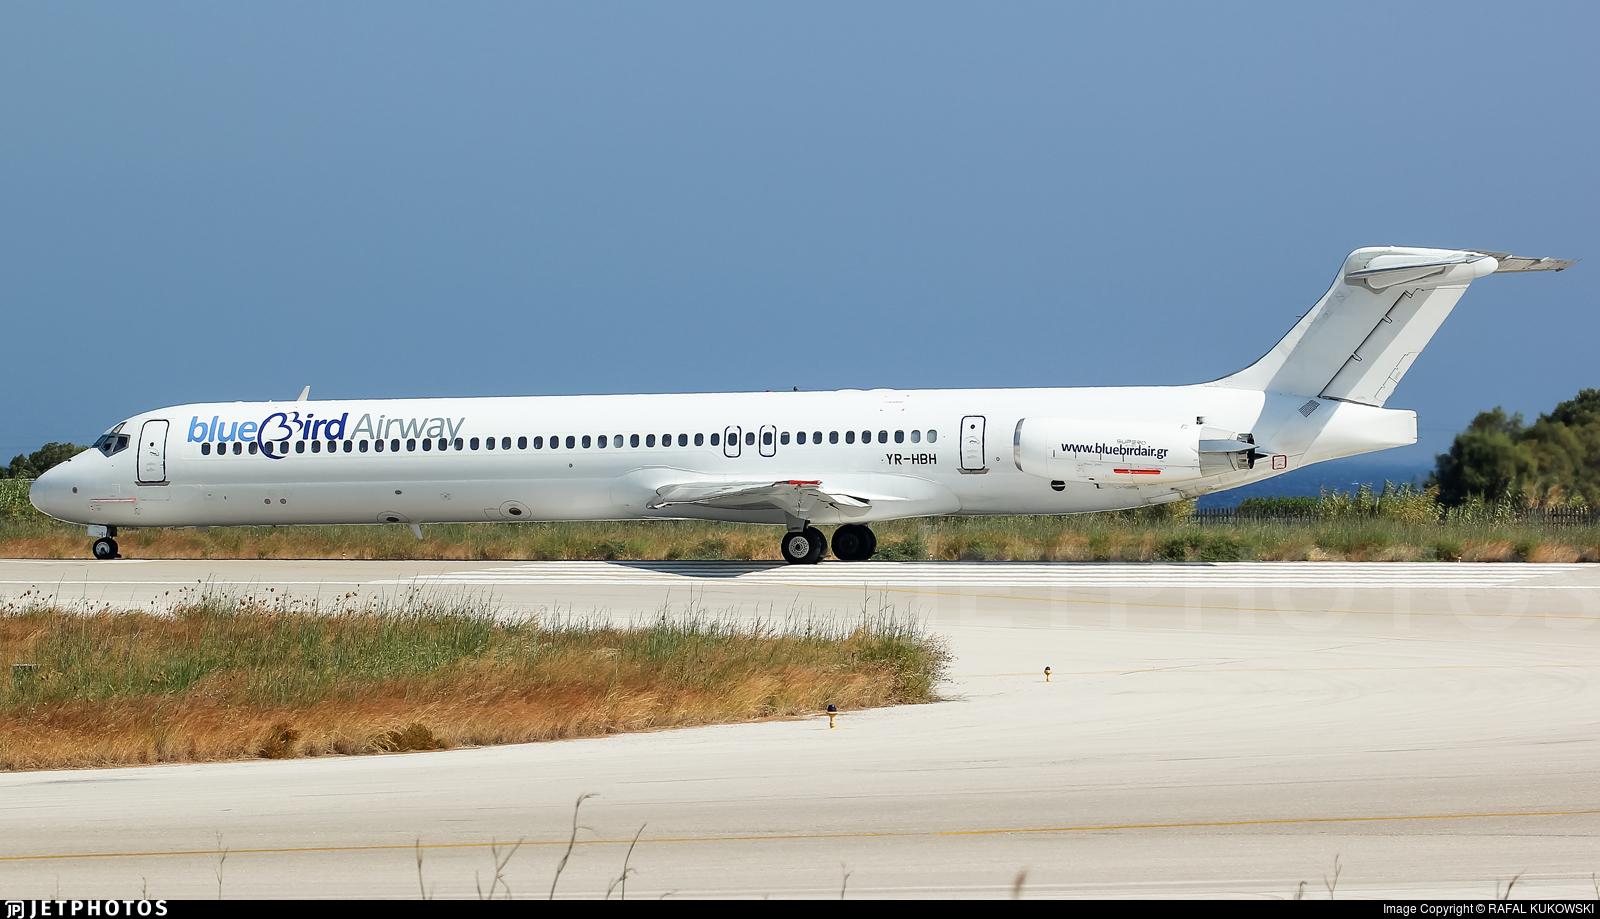 YR-HBH - McDonnell Douglas MD-83 - Bluebird Airways